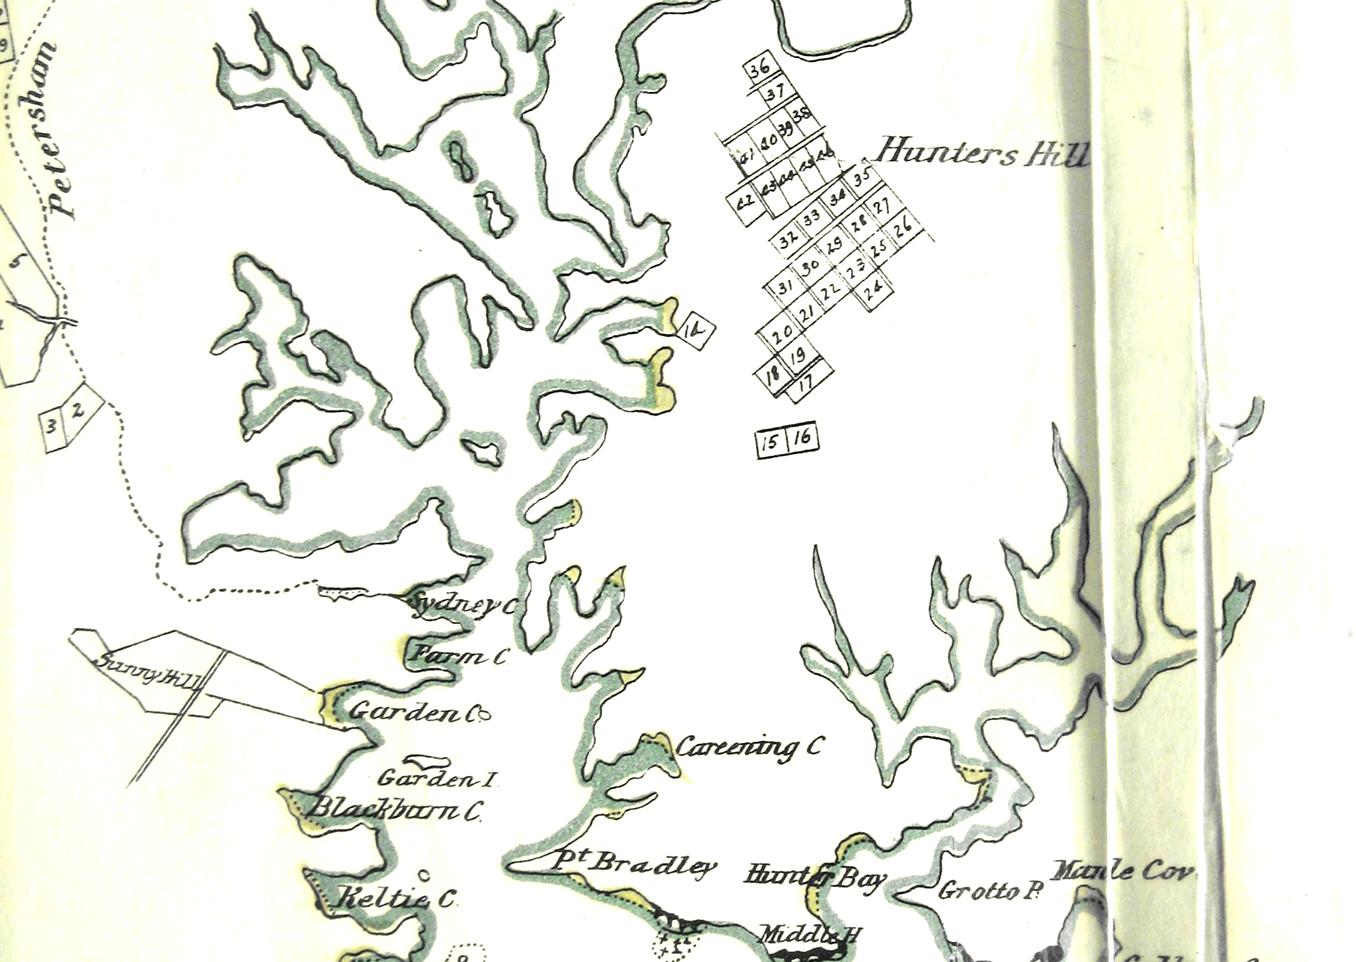 Hunters Hill Map